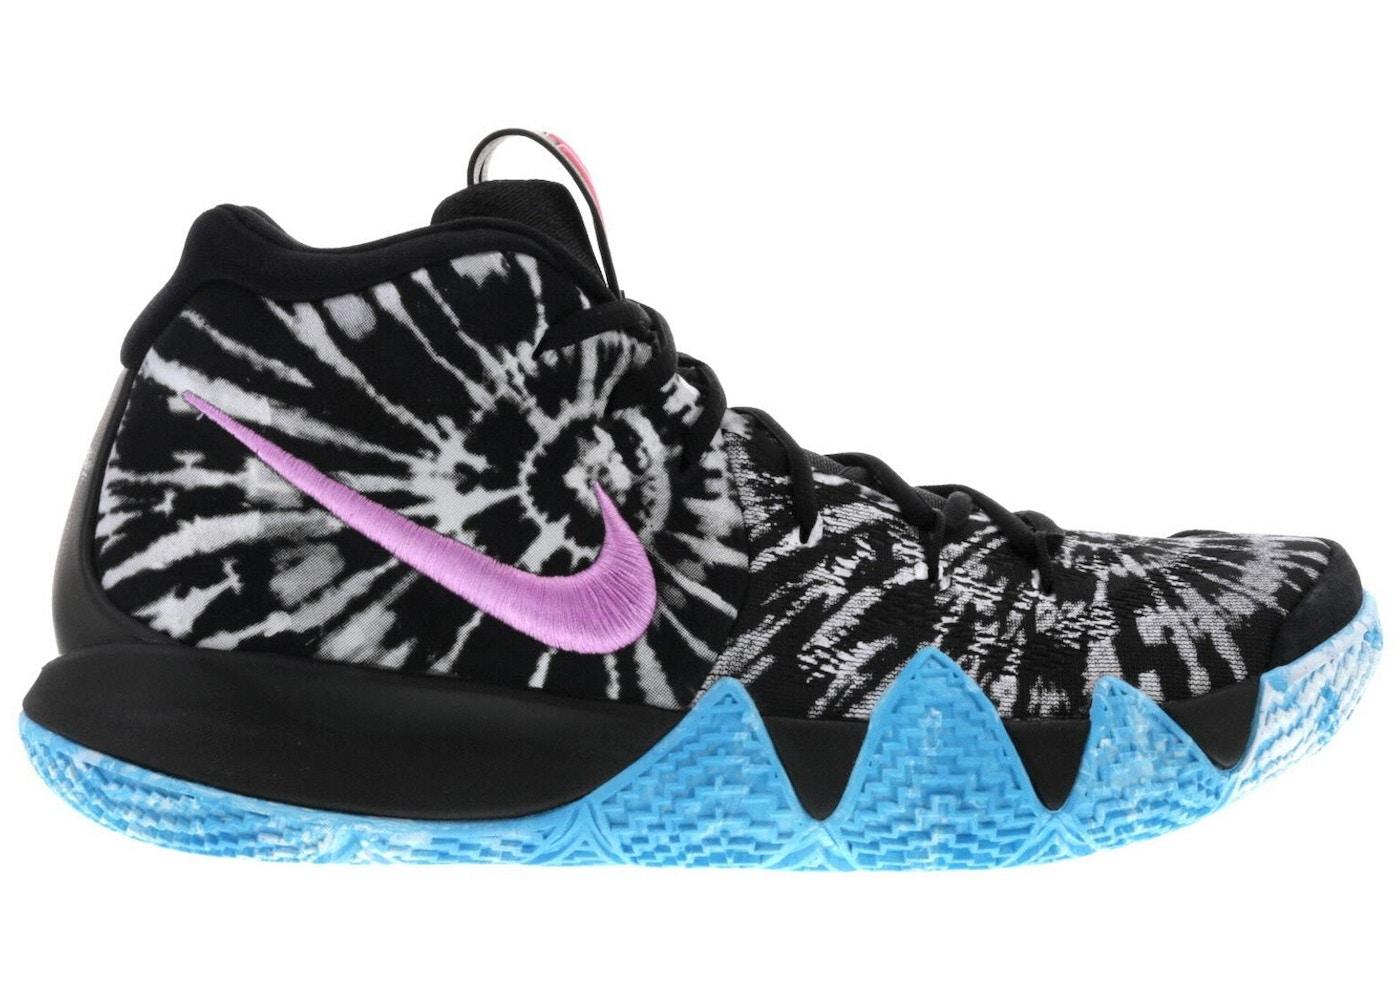 f6e7bb253b0e Buy Nike Basketball Kyrie Shoes   Deadstock Sneakers